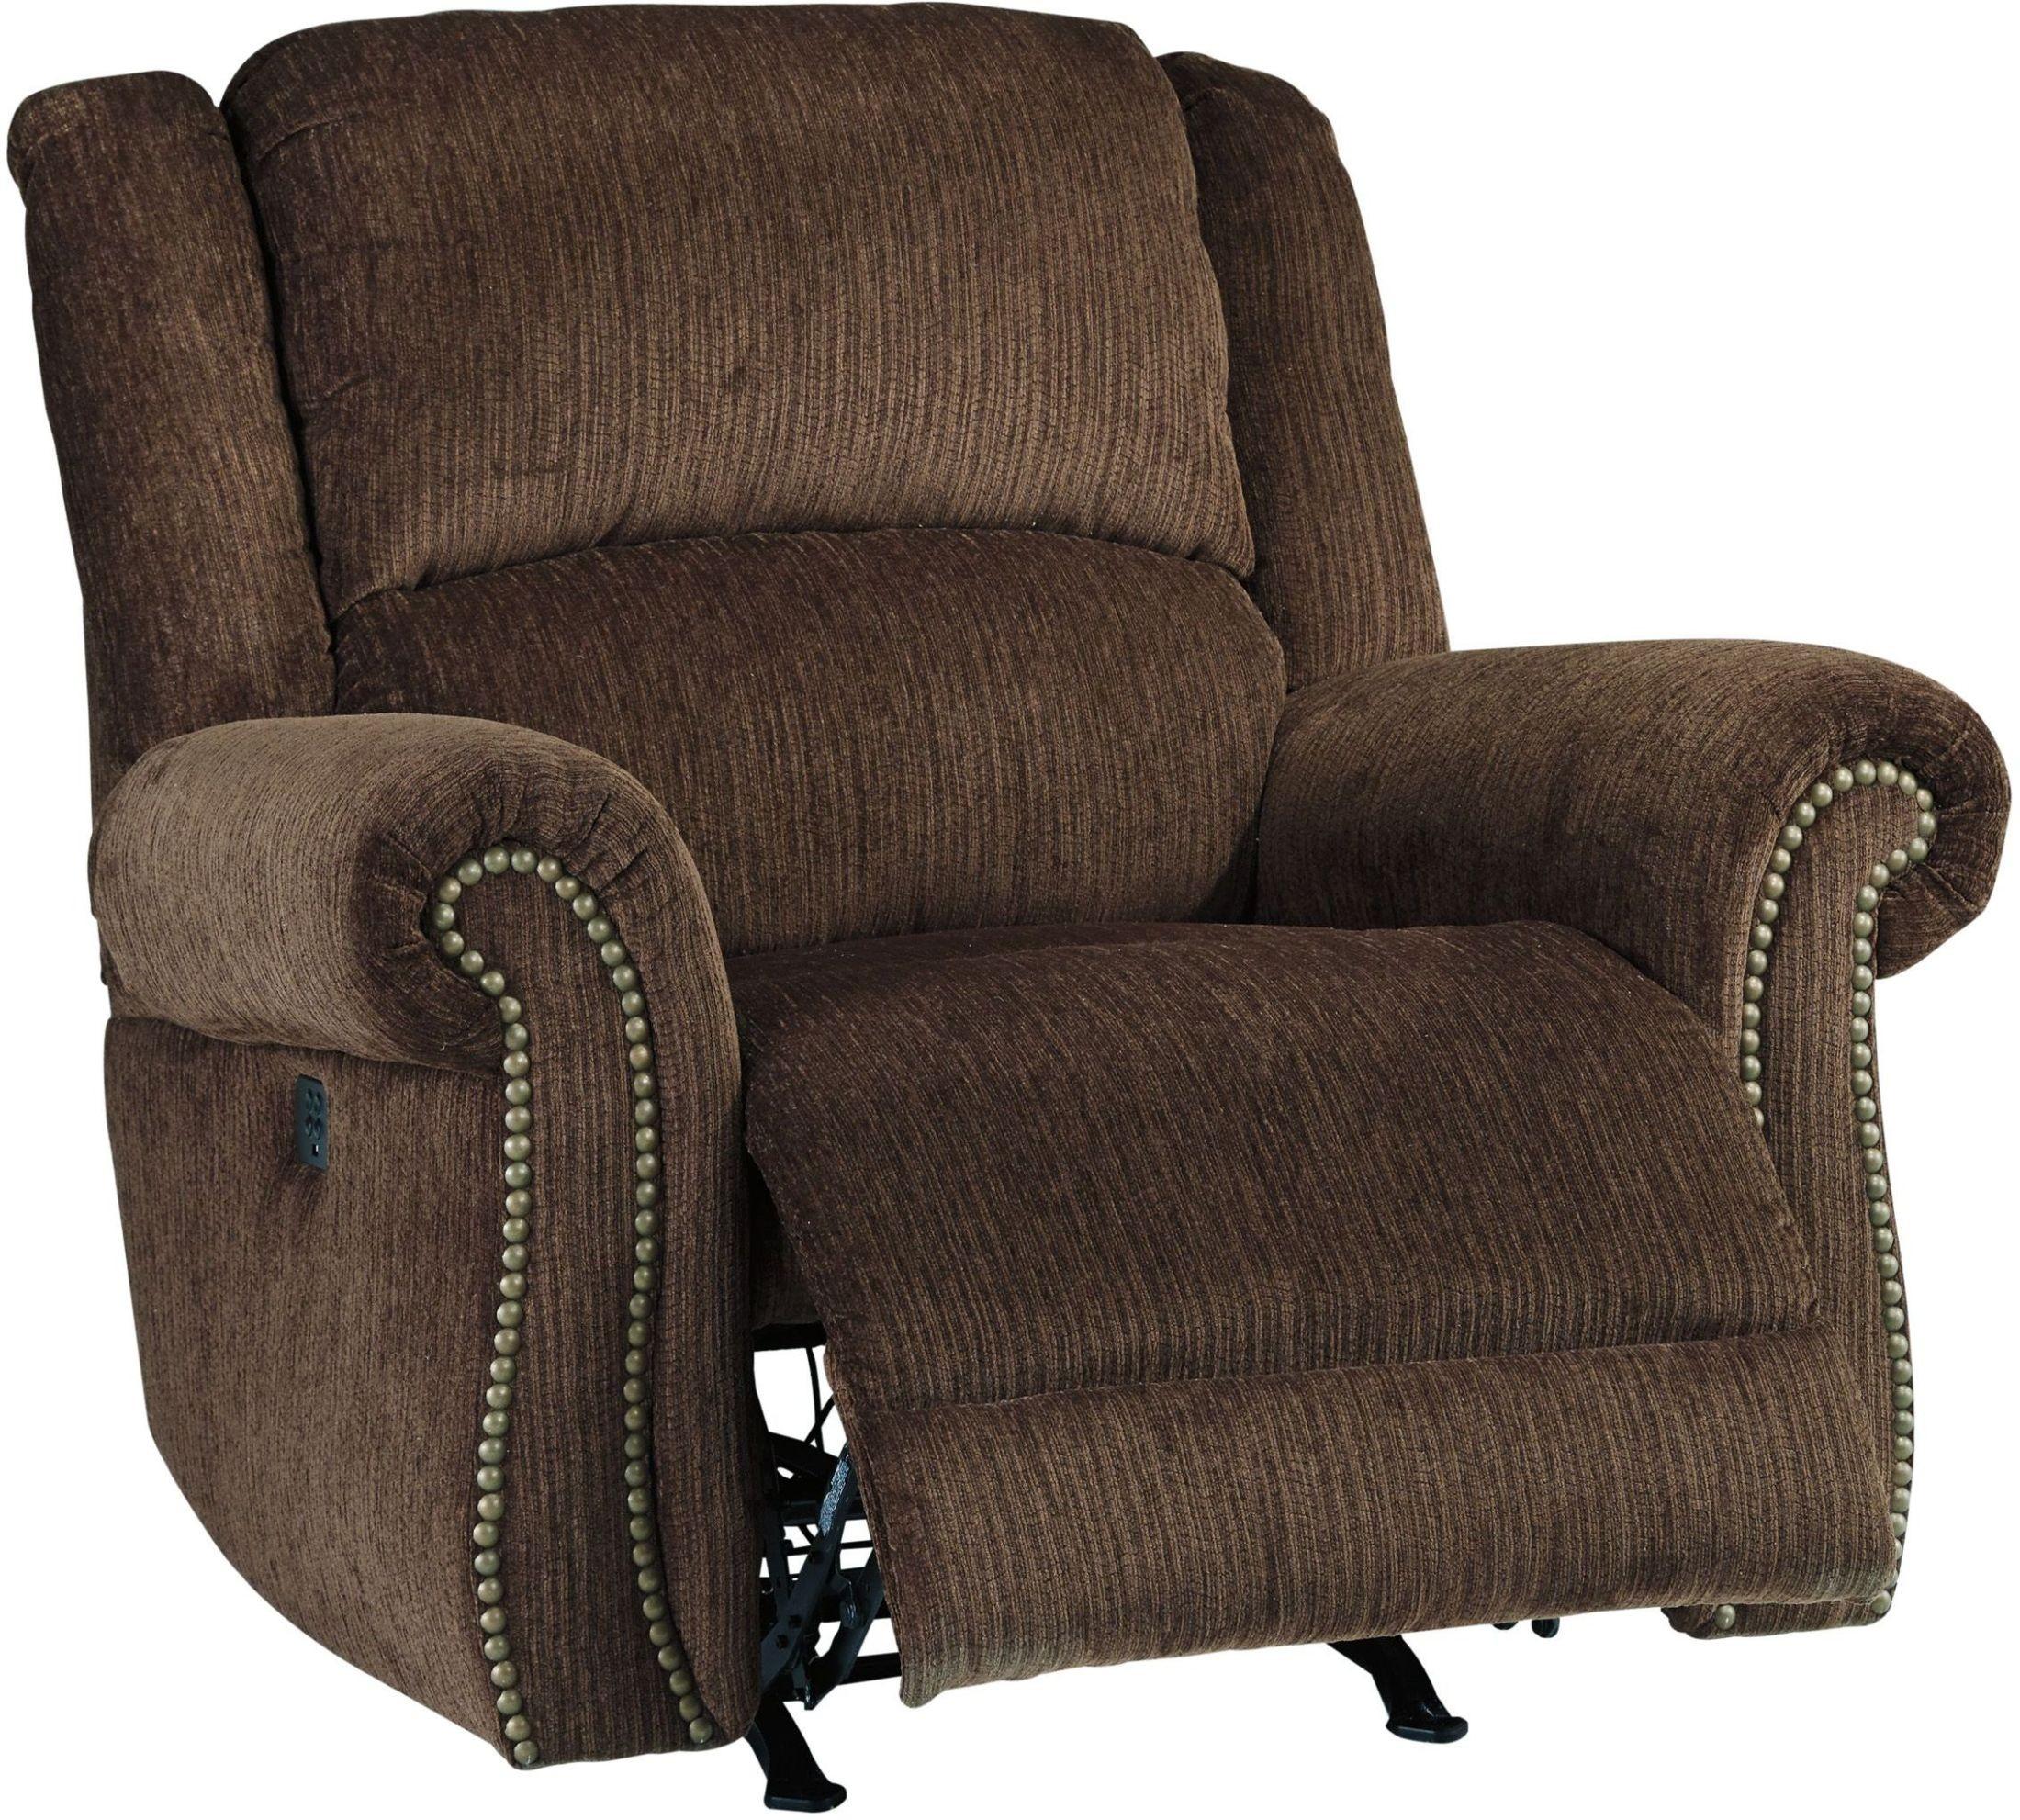 Goodlow Chocolate Power Recliner With Adjustable Headrest